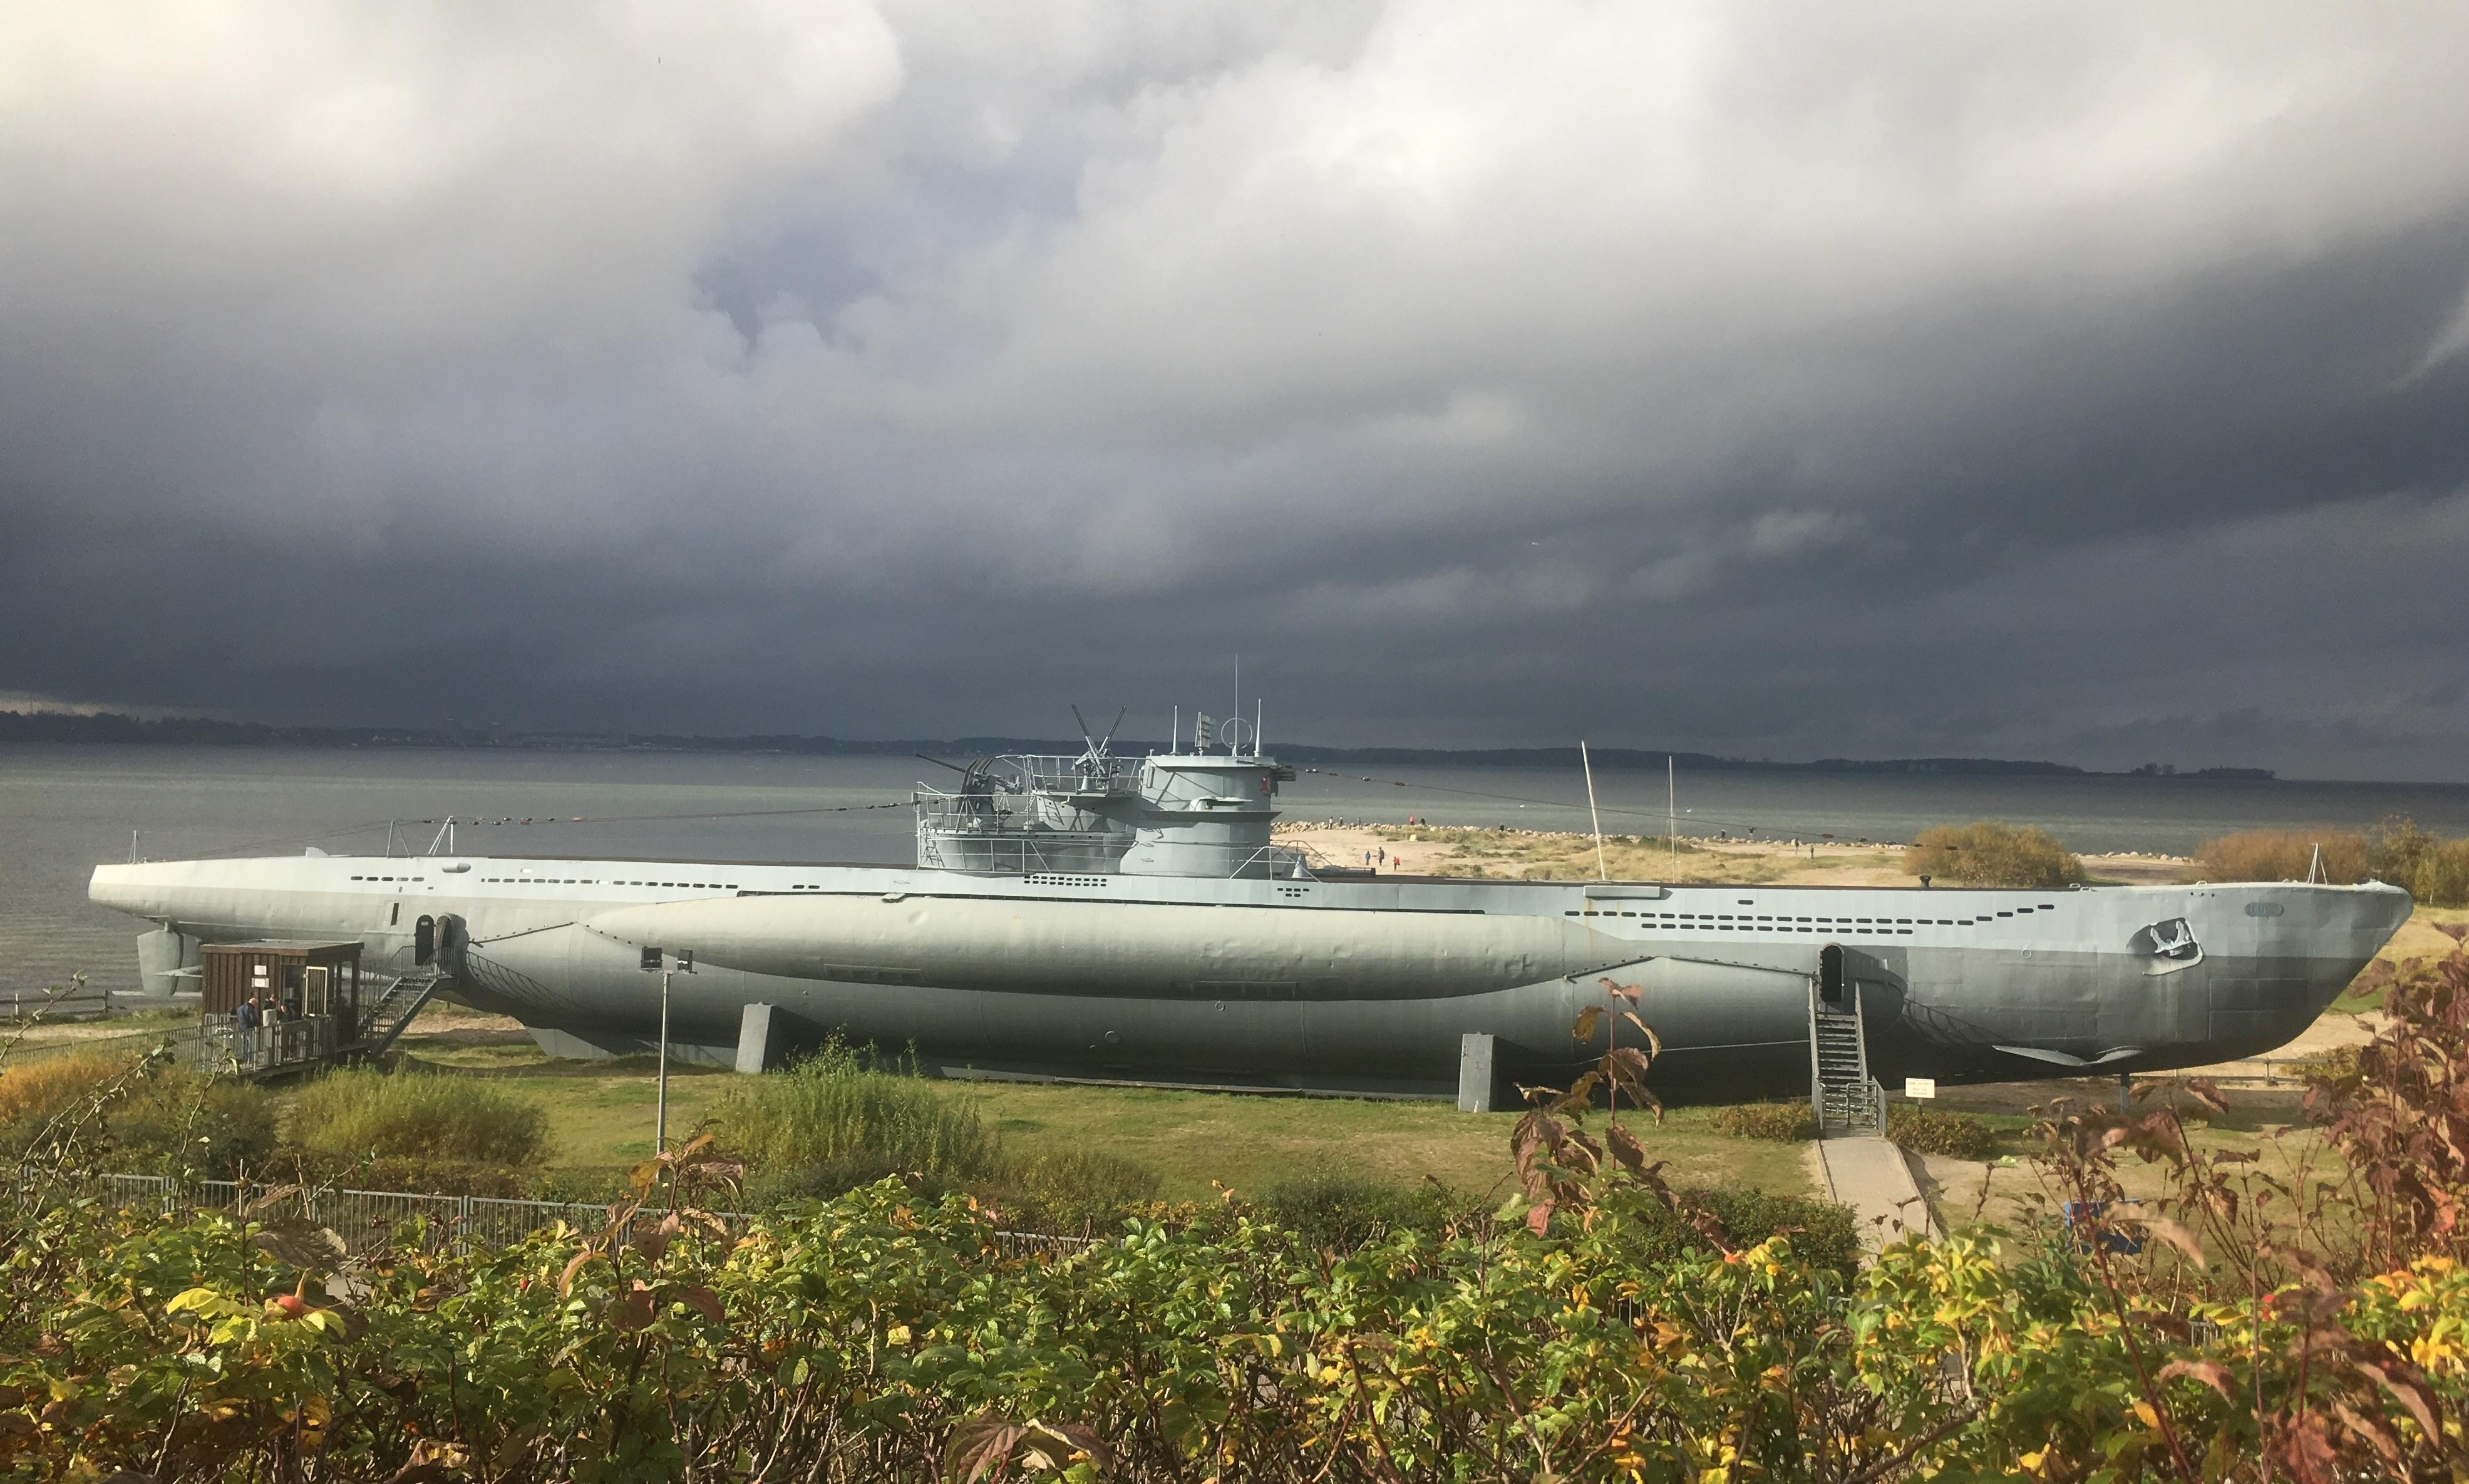 Things Helen Loves, Image of Submarine mounted on beach under grey skies.